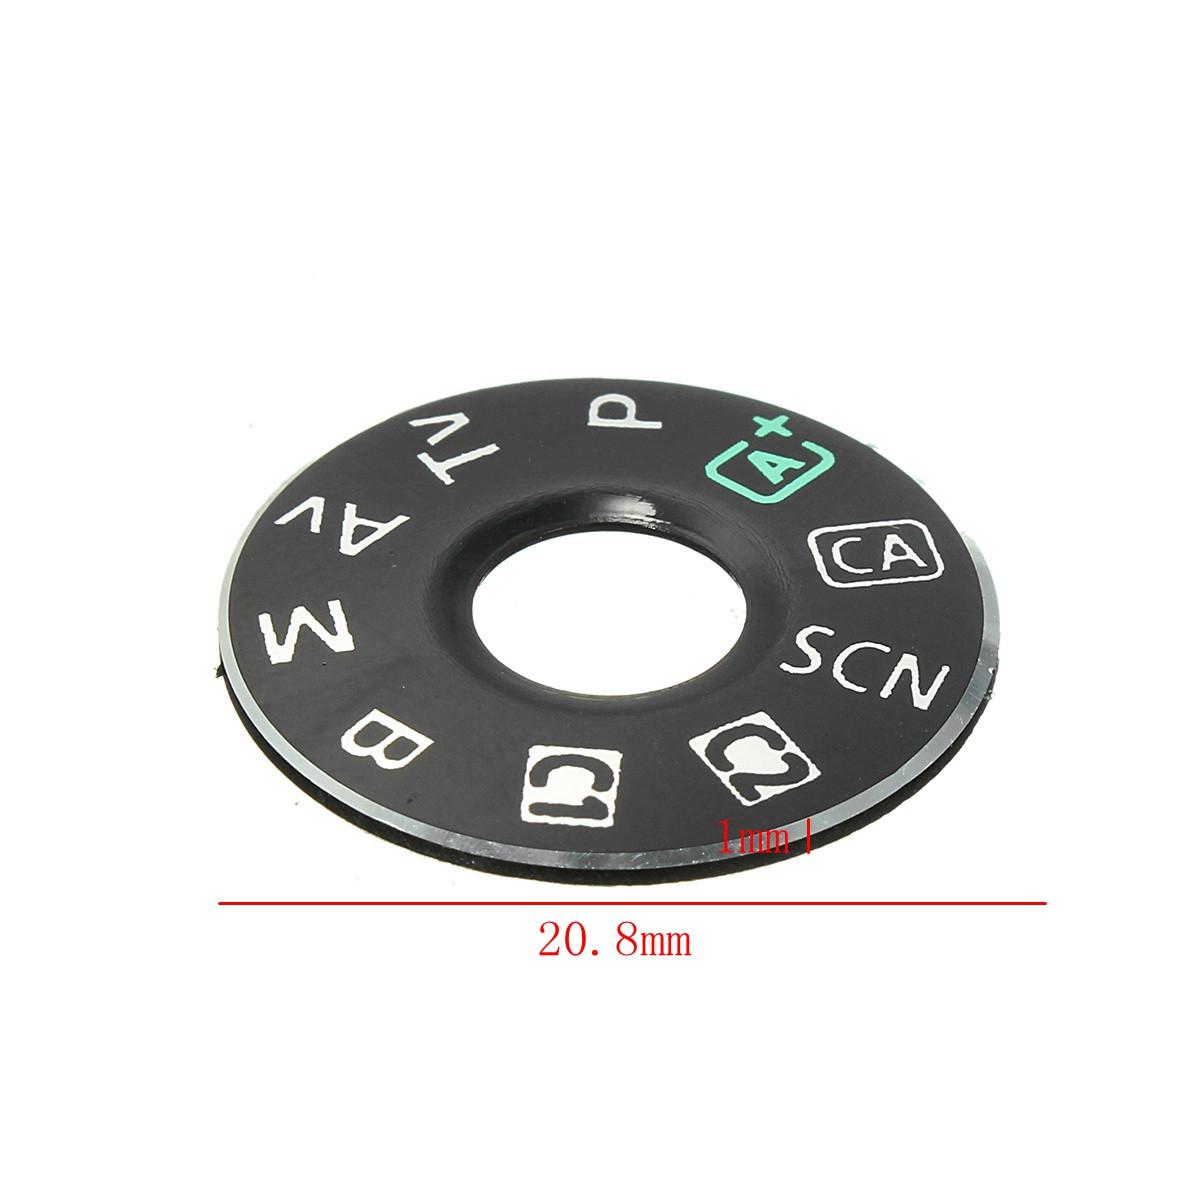 canon 6d user manual pdf